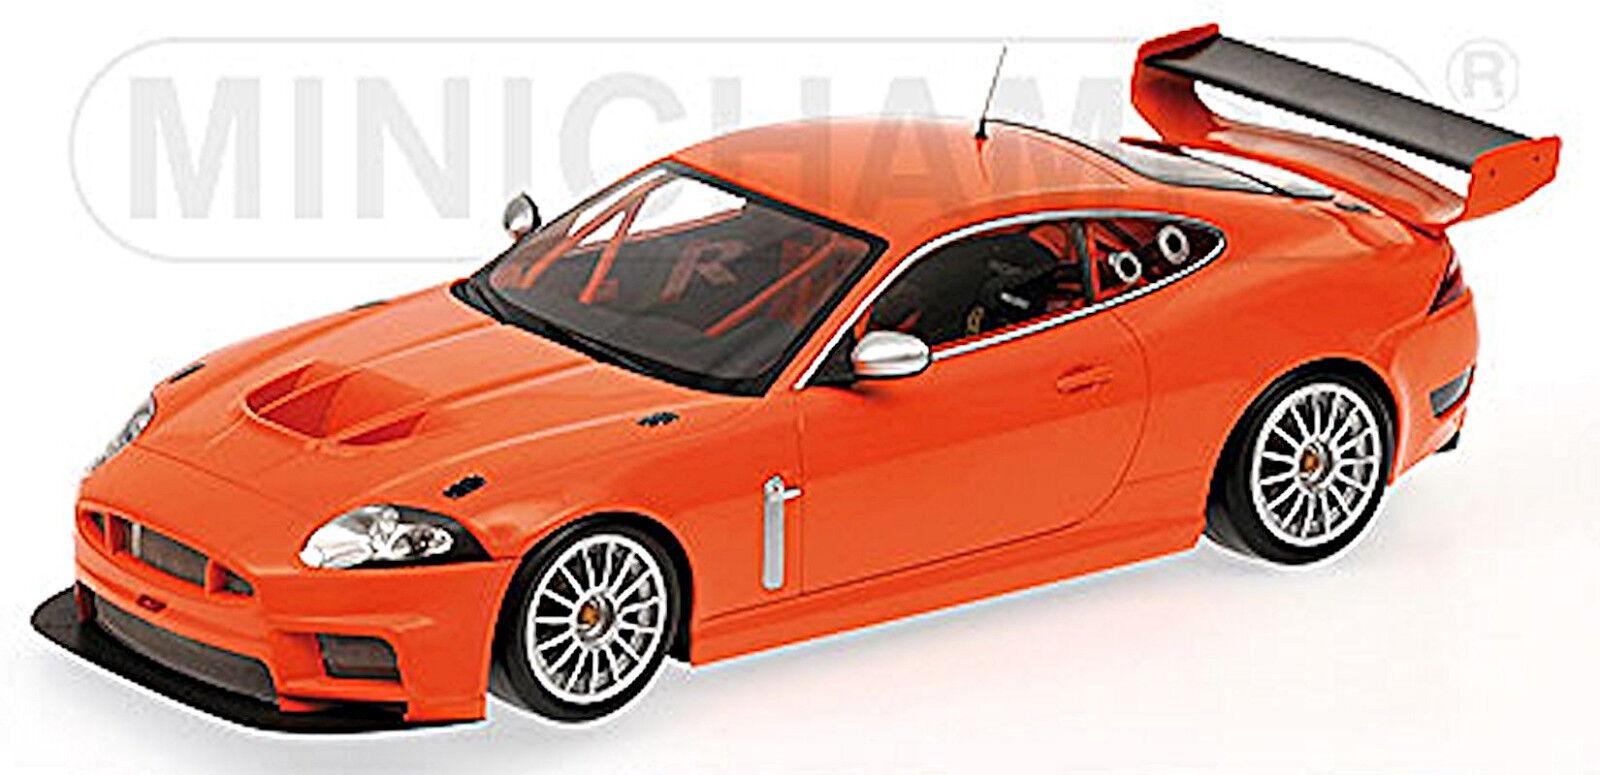 Jaguar XKR GT3 2008 Orange 1 18 Minichamps  | Exzellente Verarbeitung